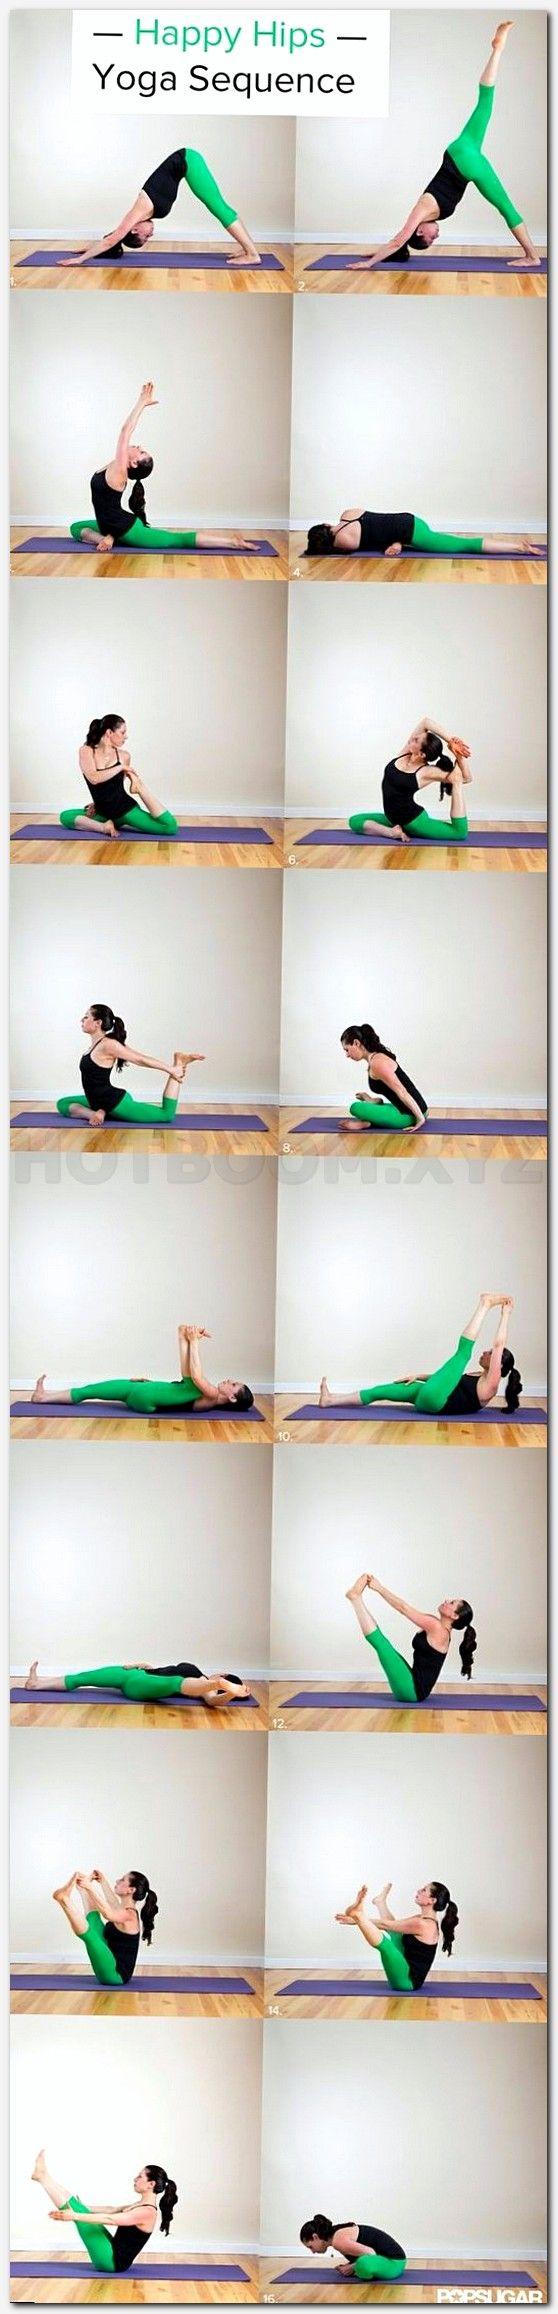 ramdev yoga diet plan